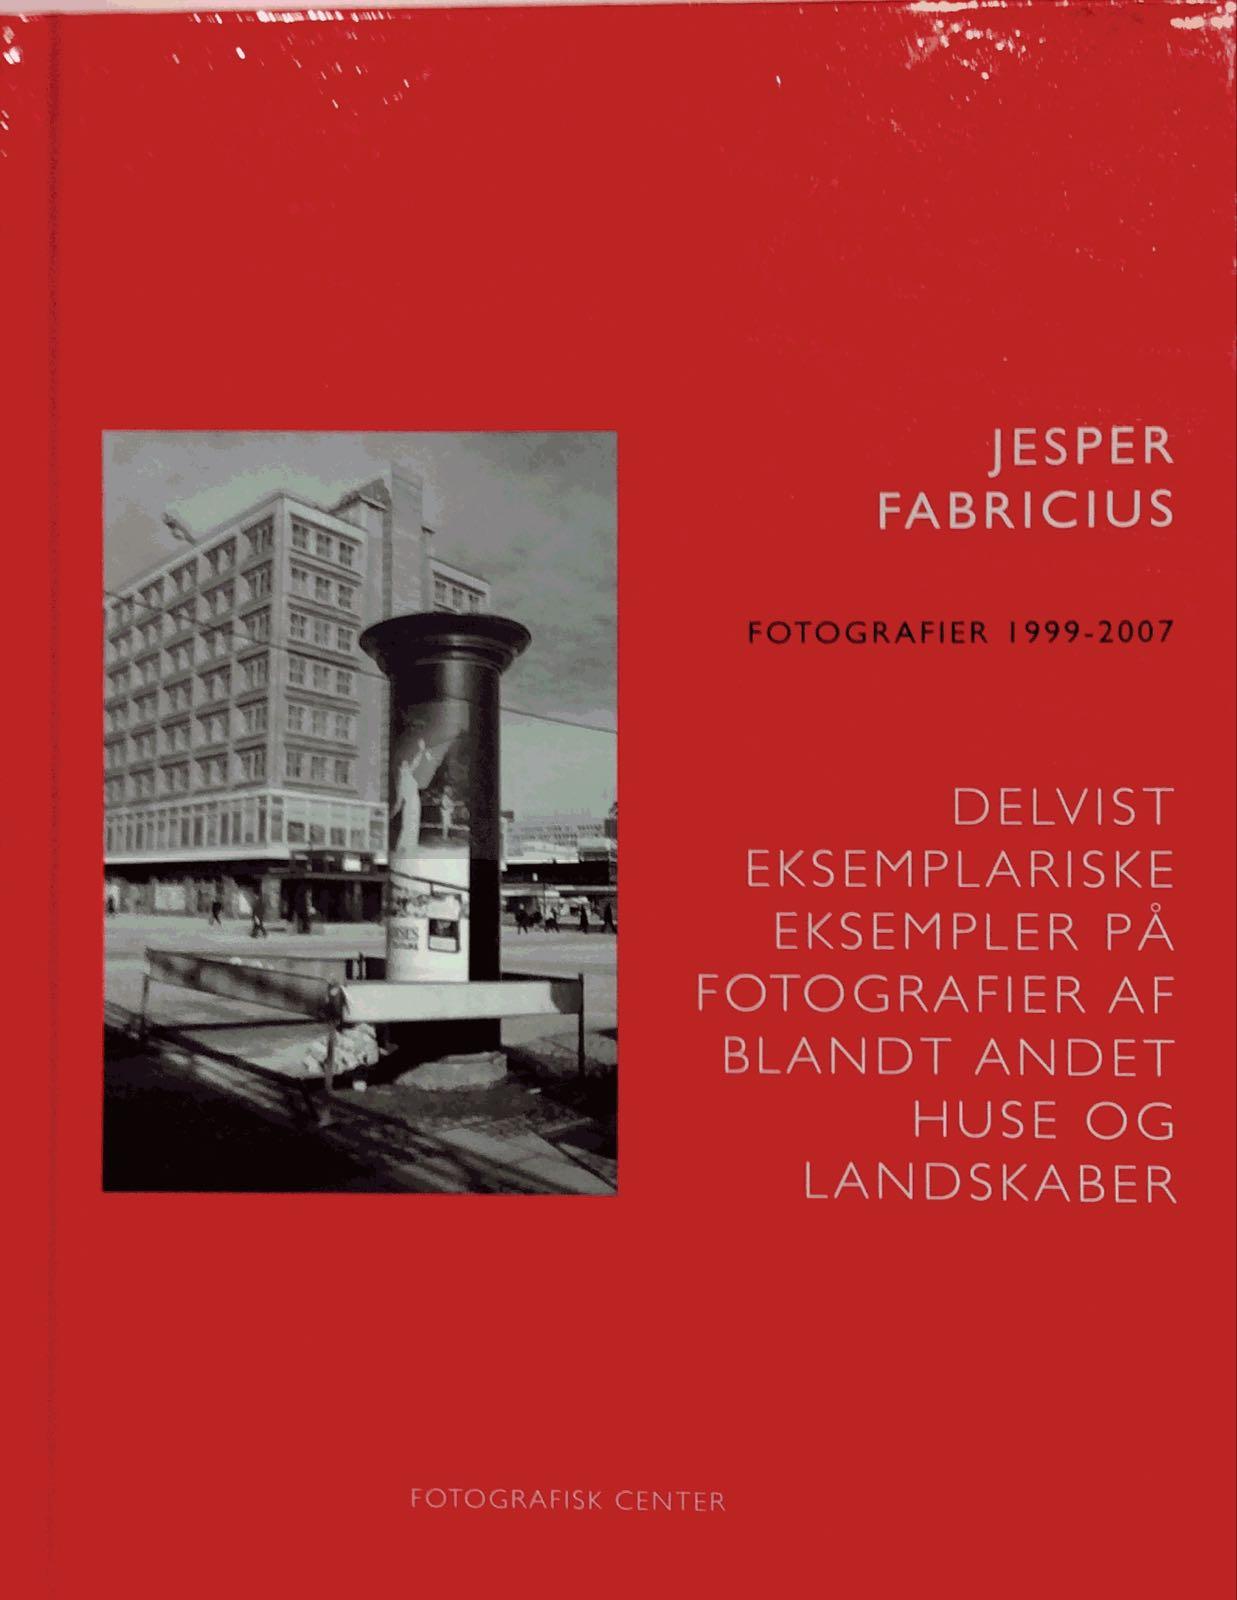 Fabricius, Jesper. Delvist eksemplariske....